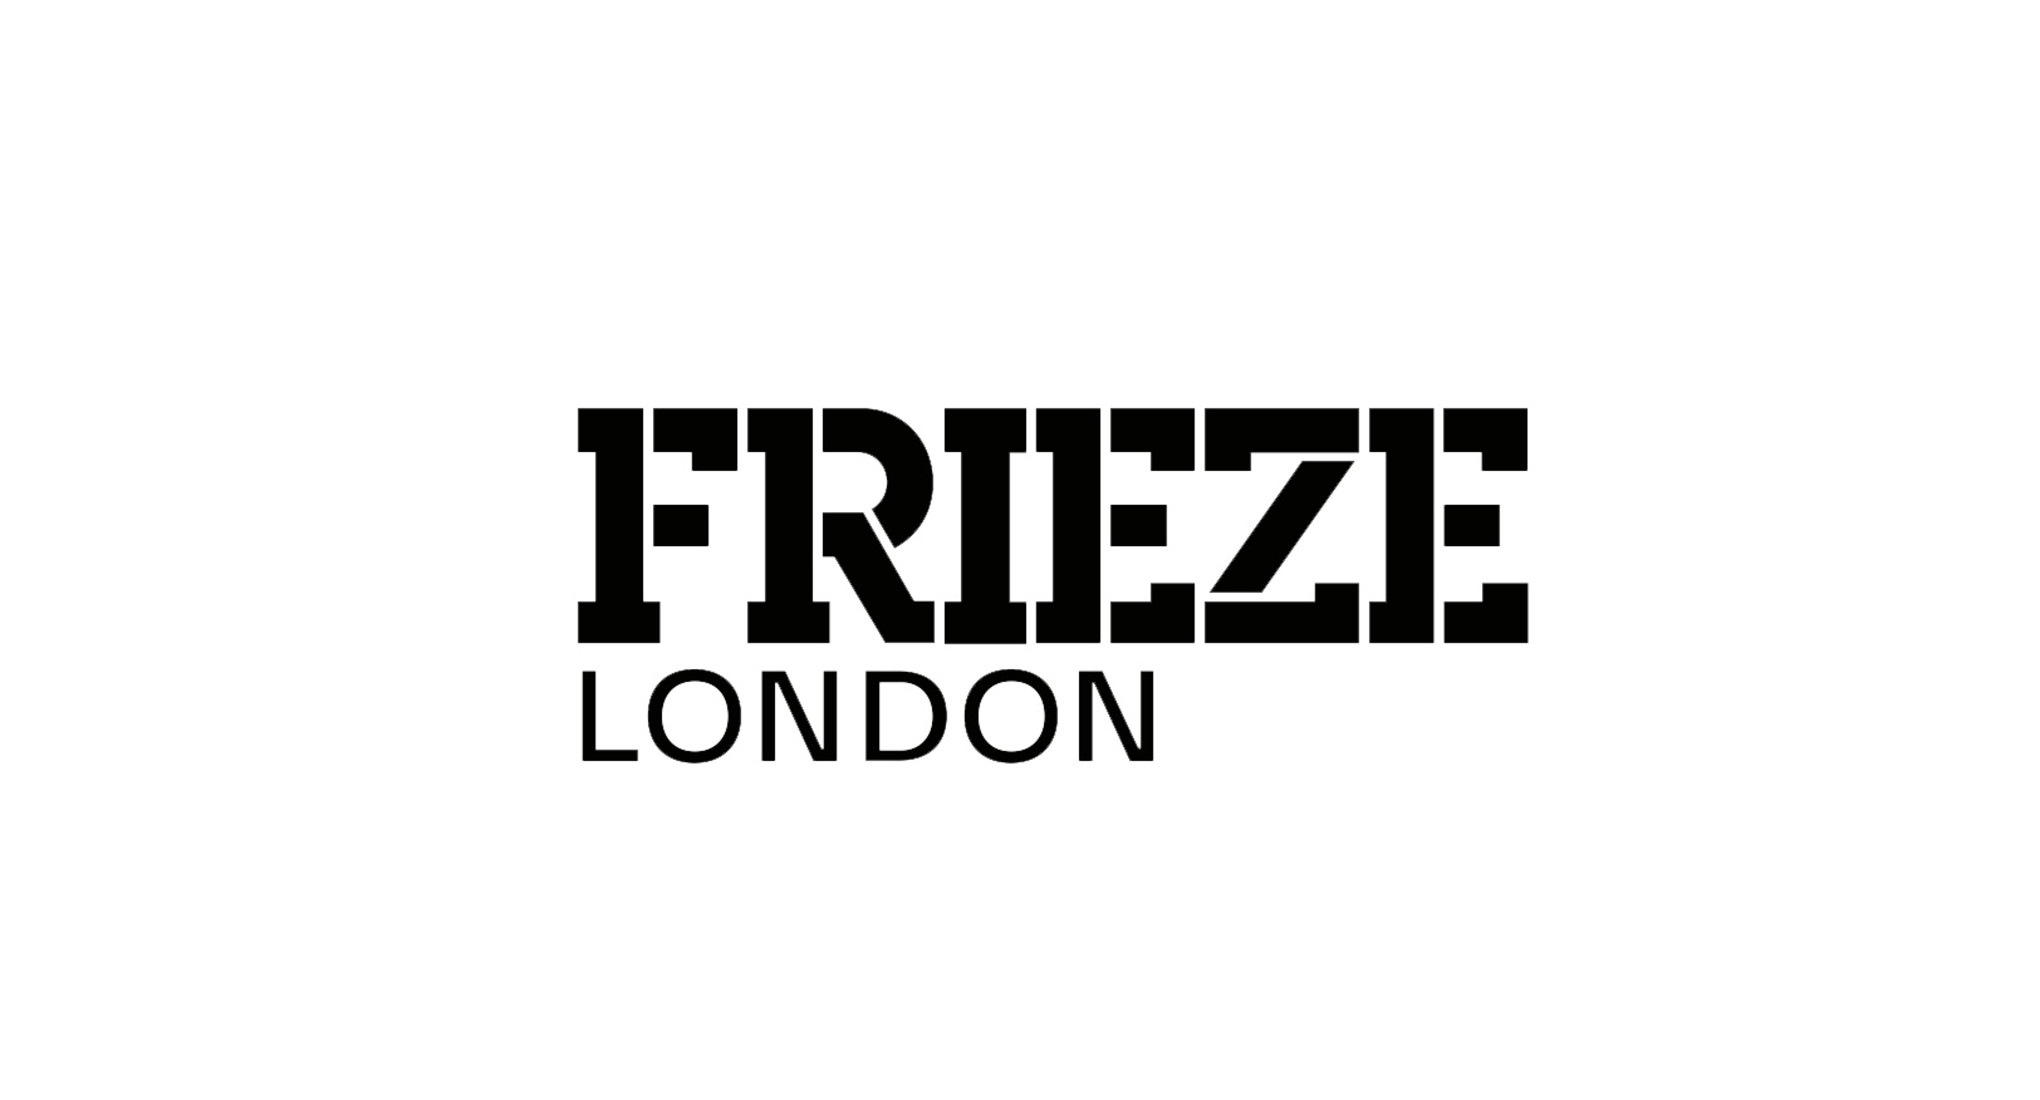 Frieze London